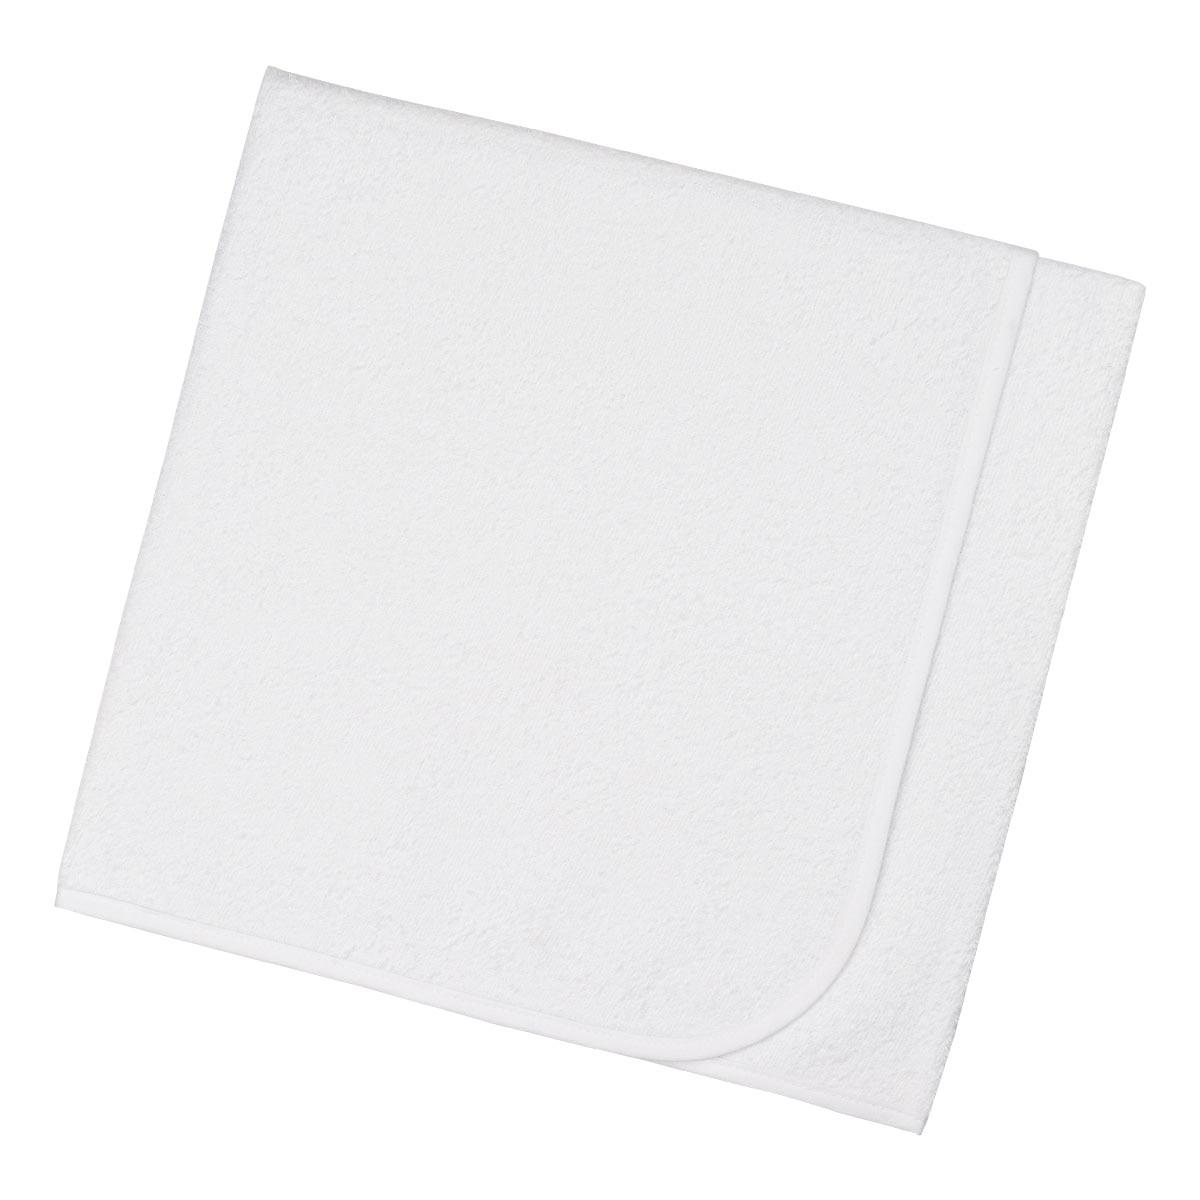 Bunny bebe σελτεδάκι 60×90 με ρέλι λευκό